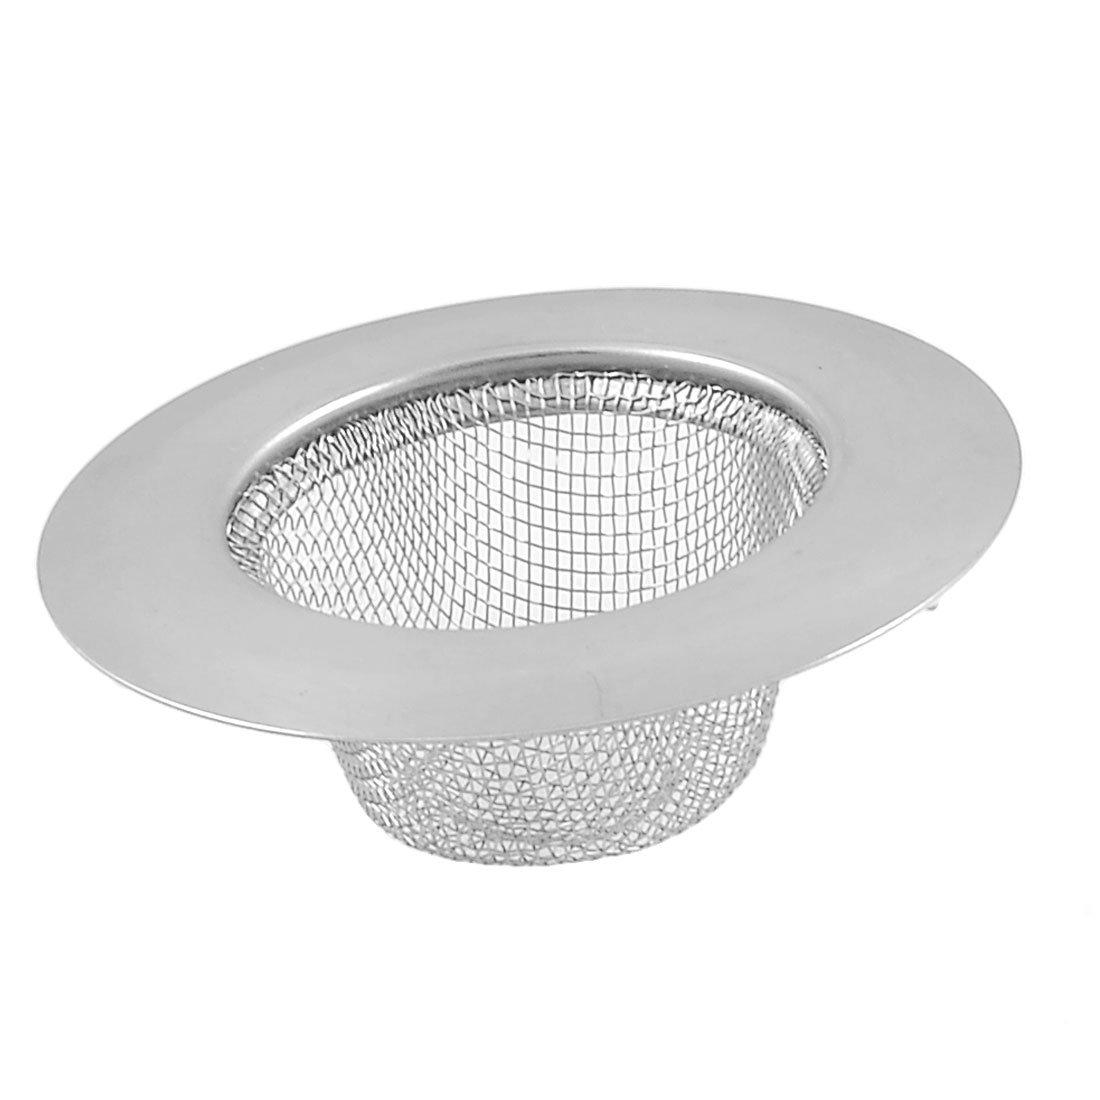 Home kitchen tono plateado acero inoxidable 7 cm Dia Lavabo Colador Sourcingmap a12102600ux0212